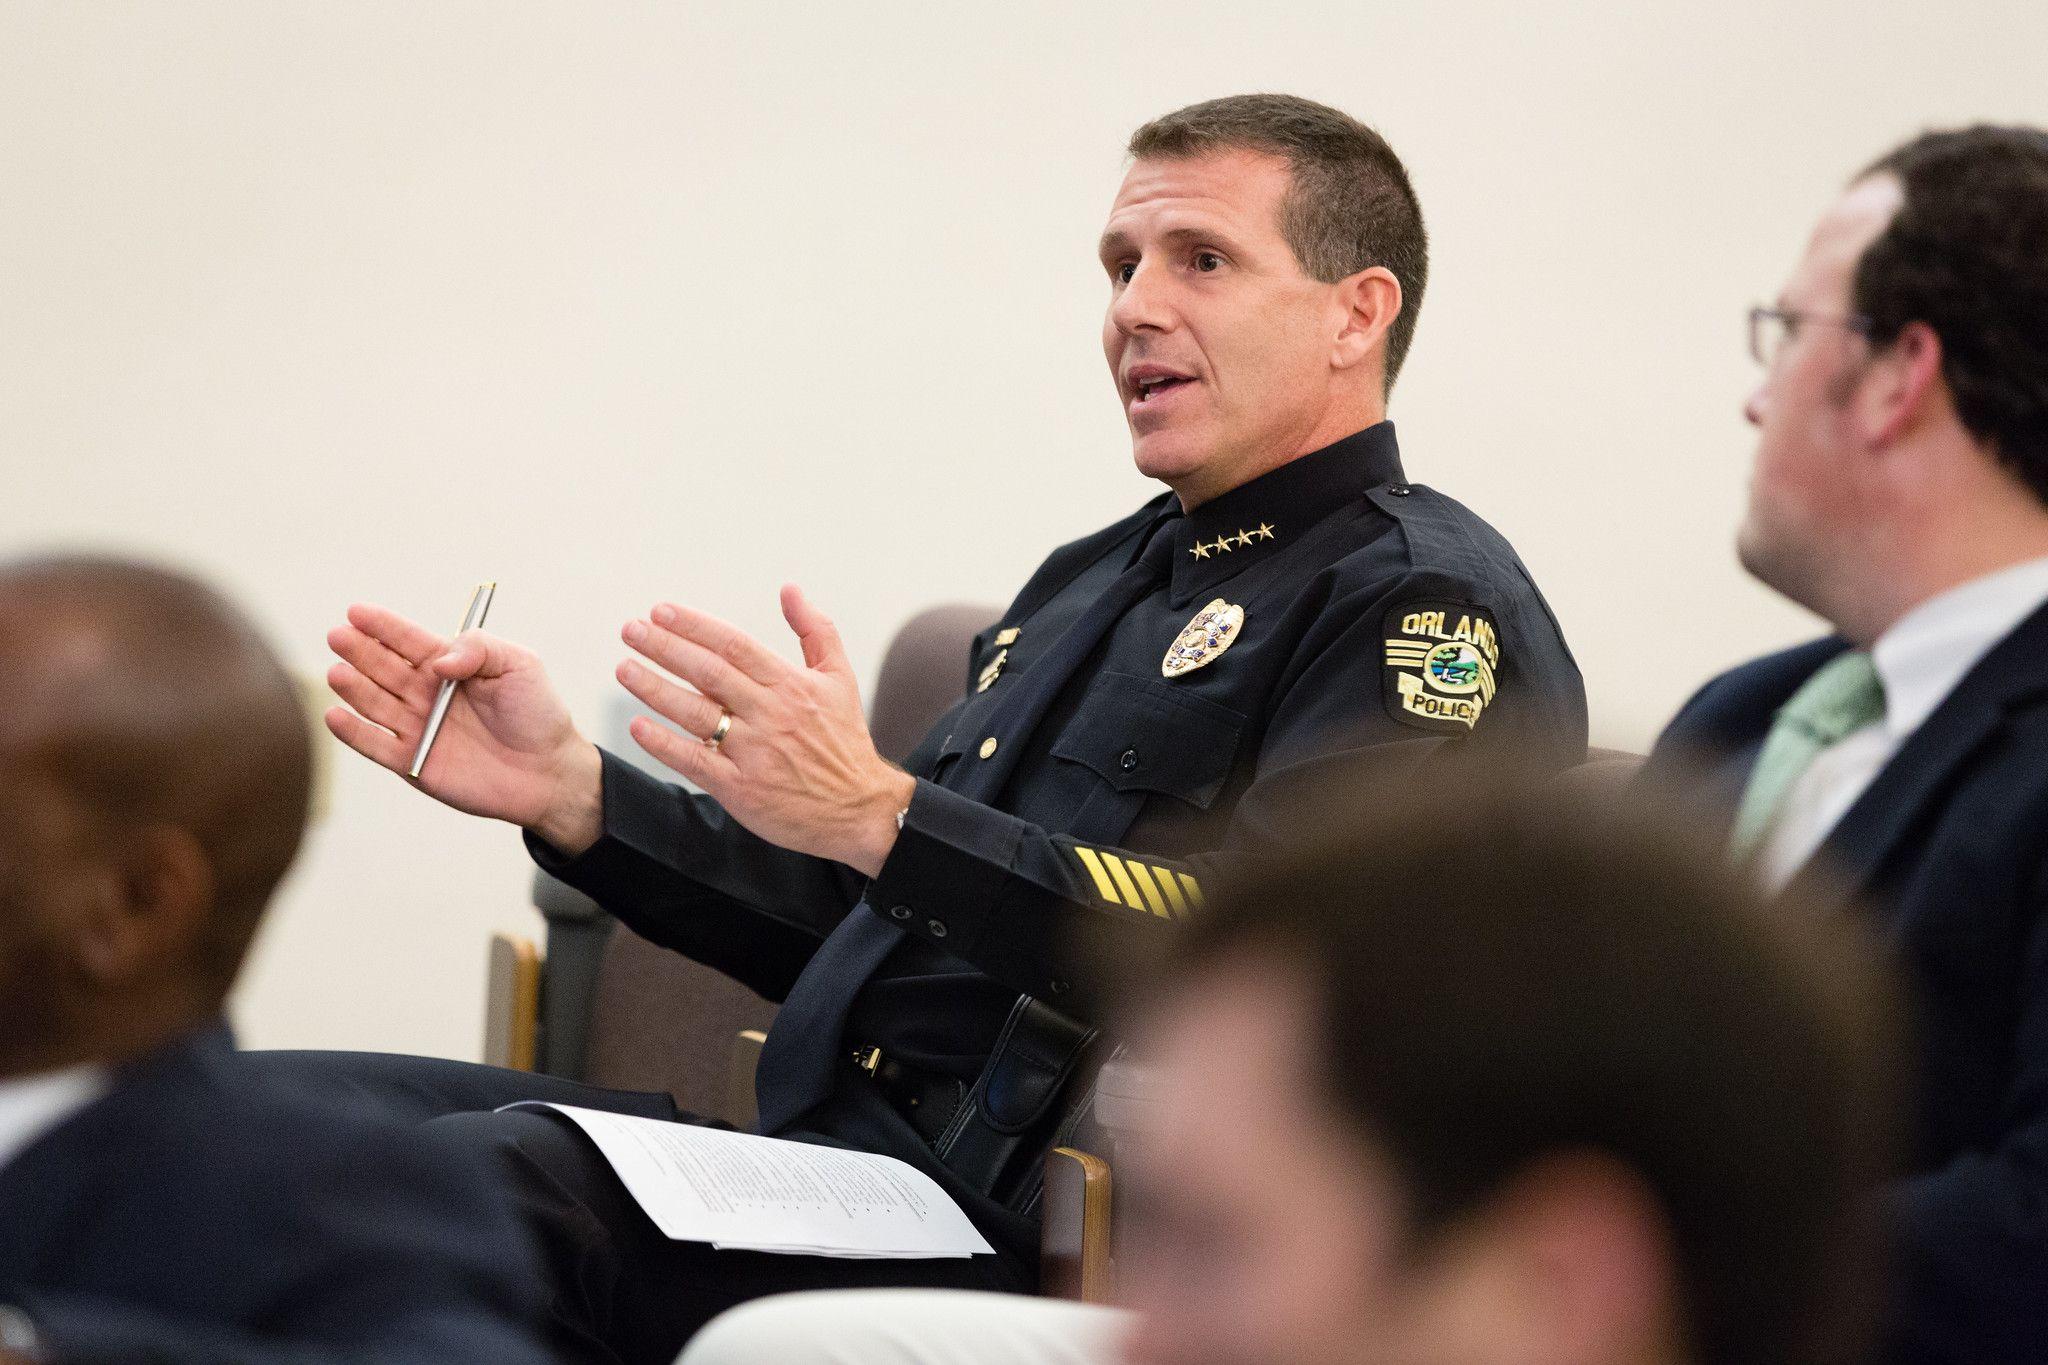 Orlando Chief of Police John Mina